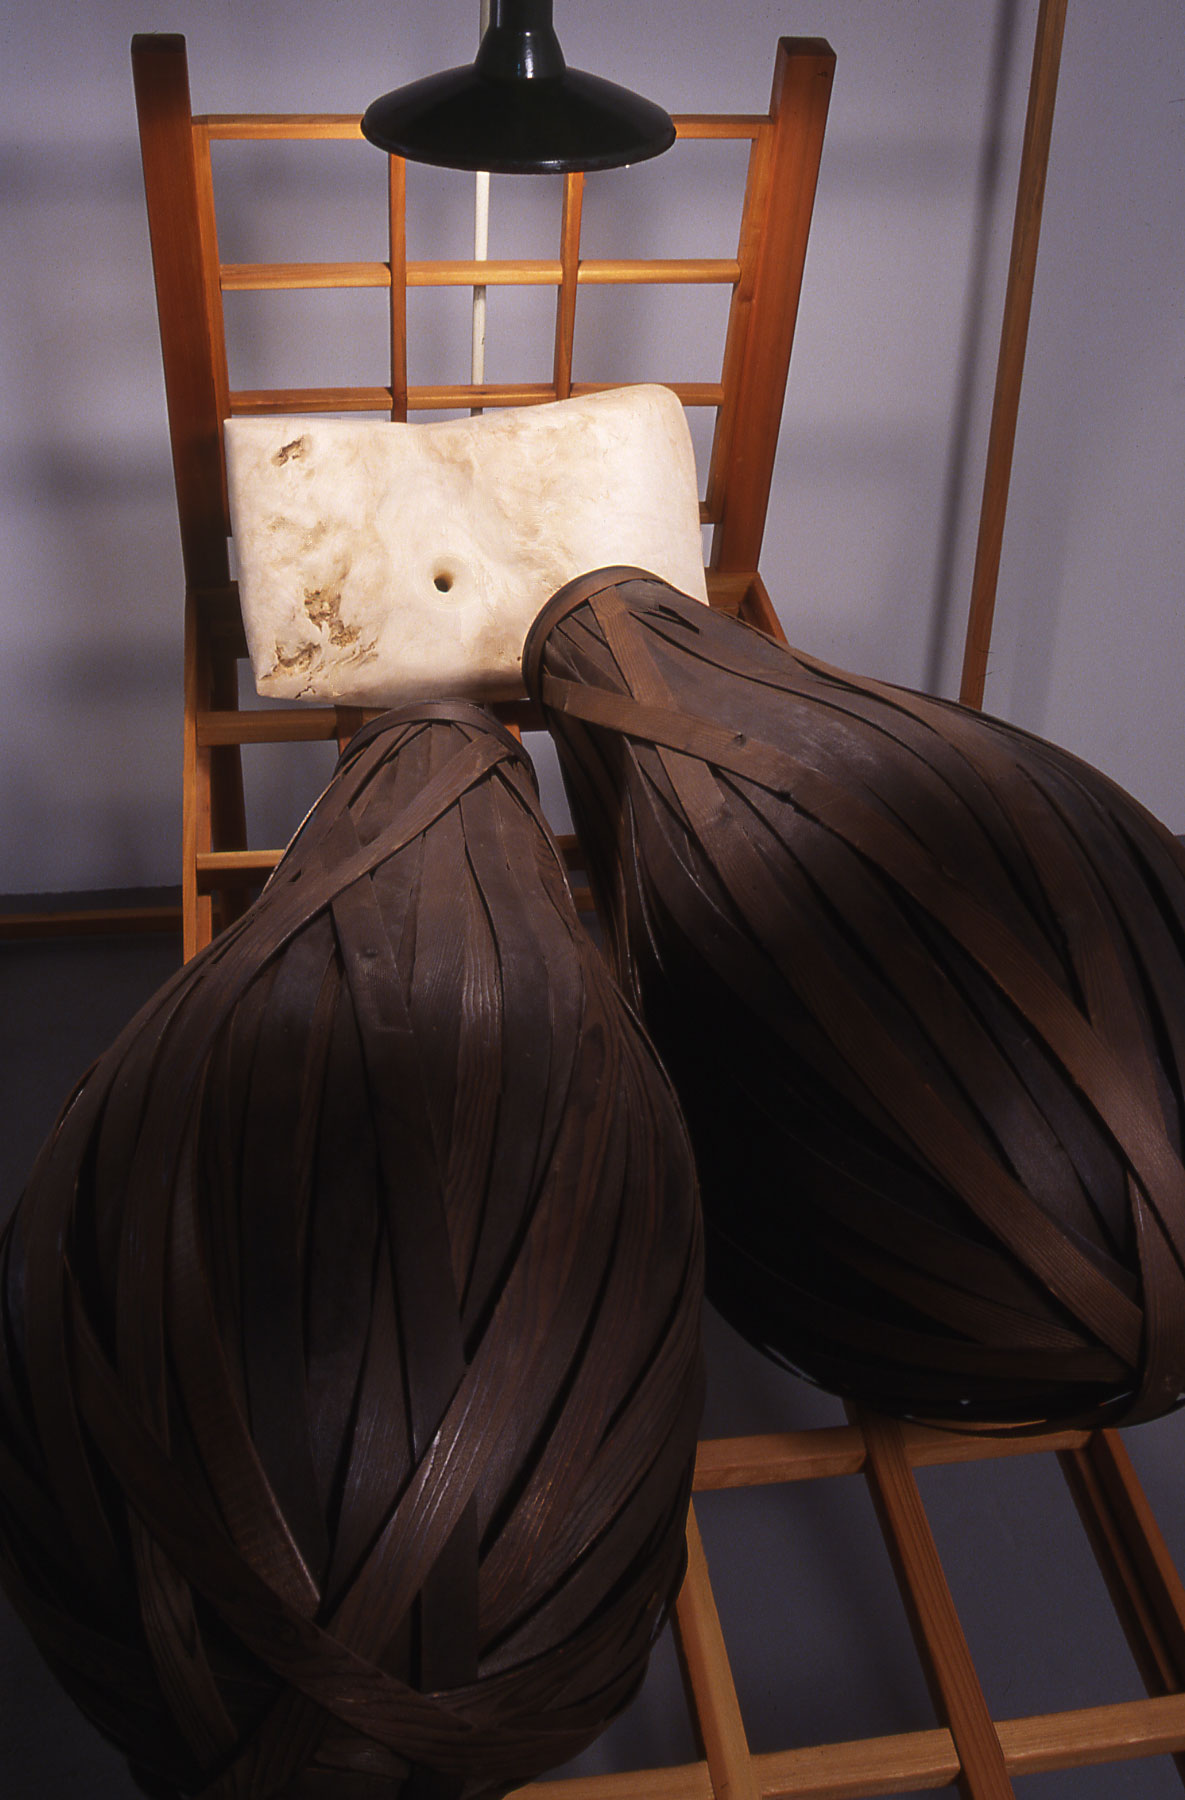 wood-sculpture-tom-gormally-sleeping-double-single-bed-detail.jpg